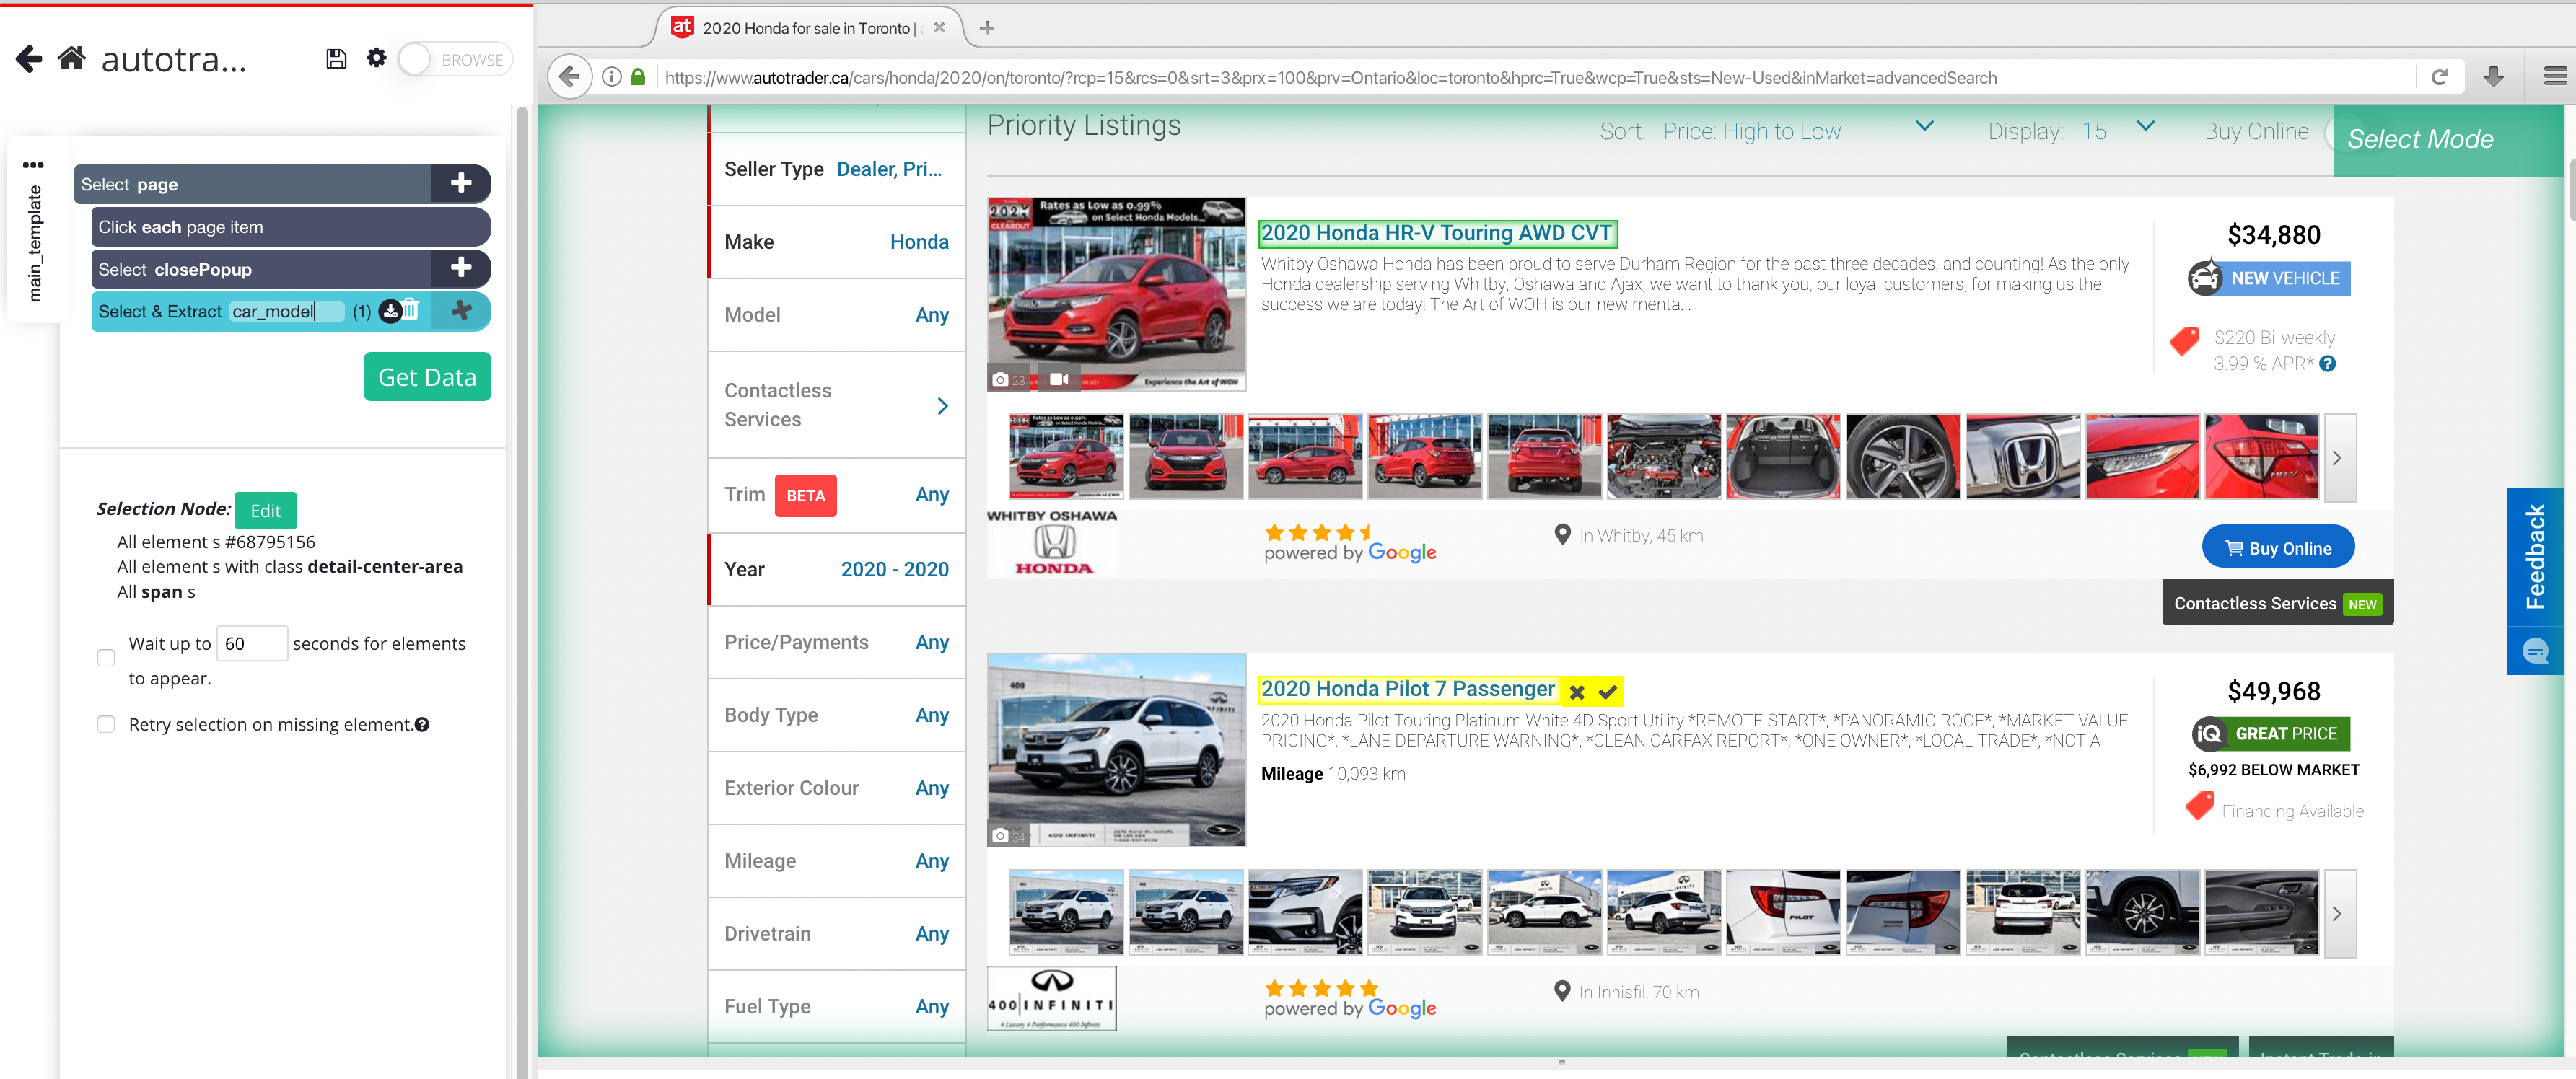 Selecting All car models